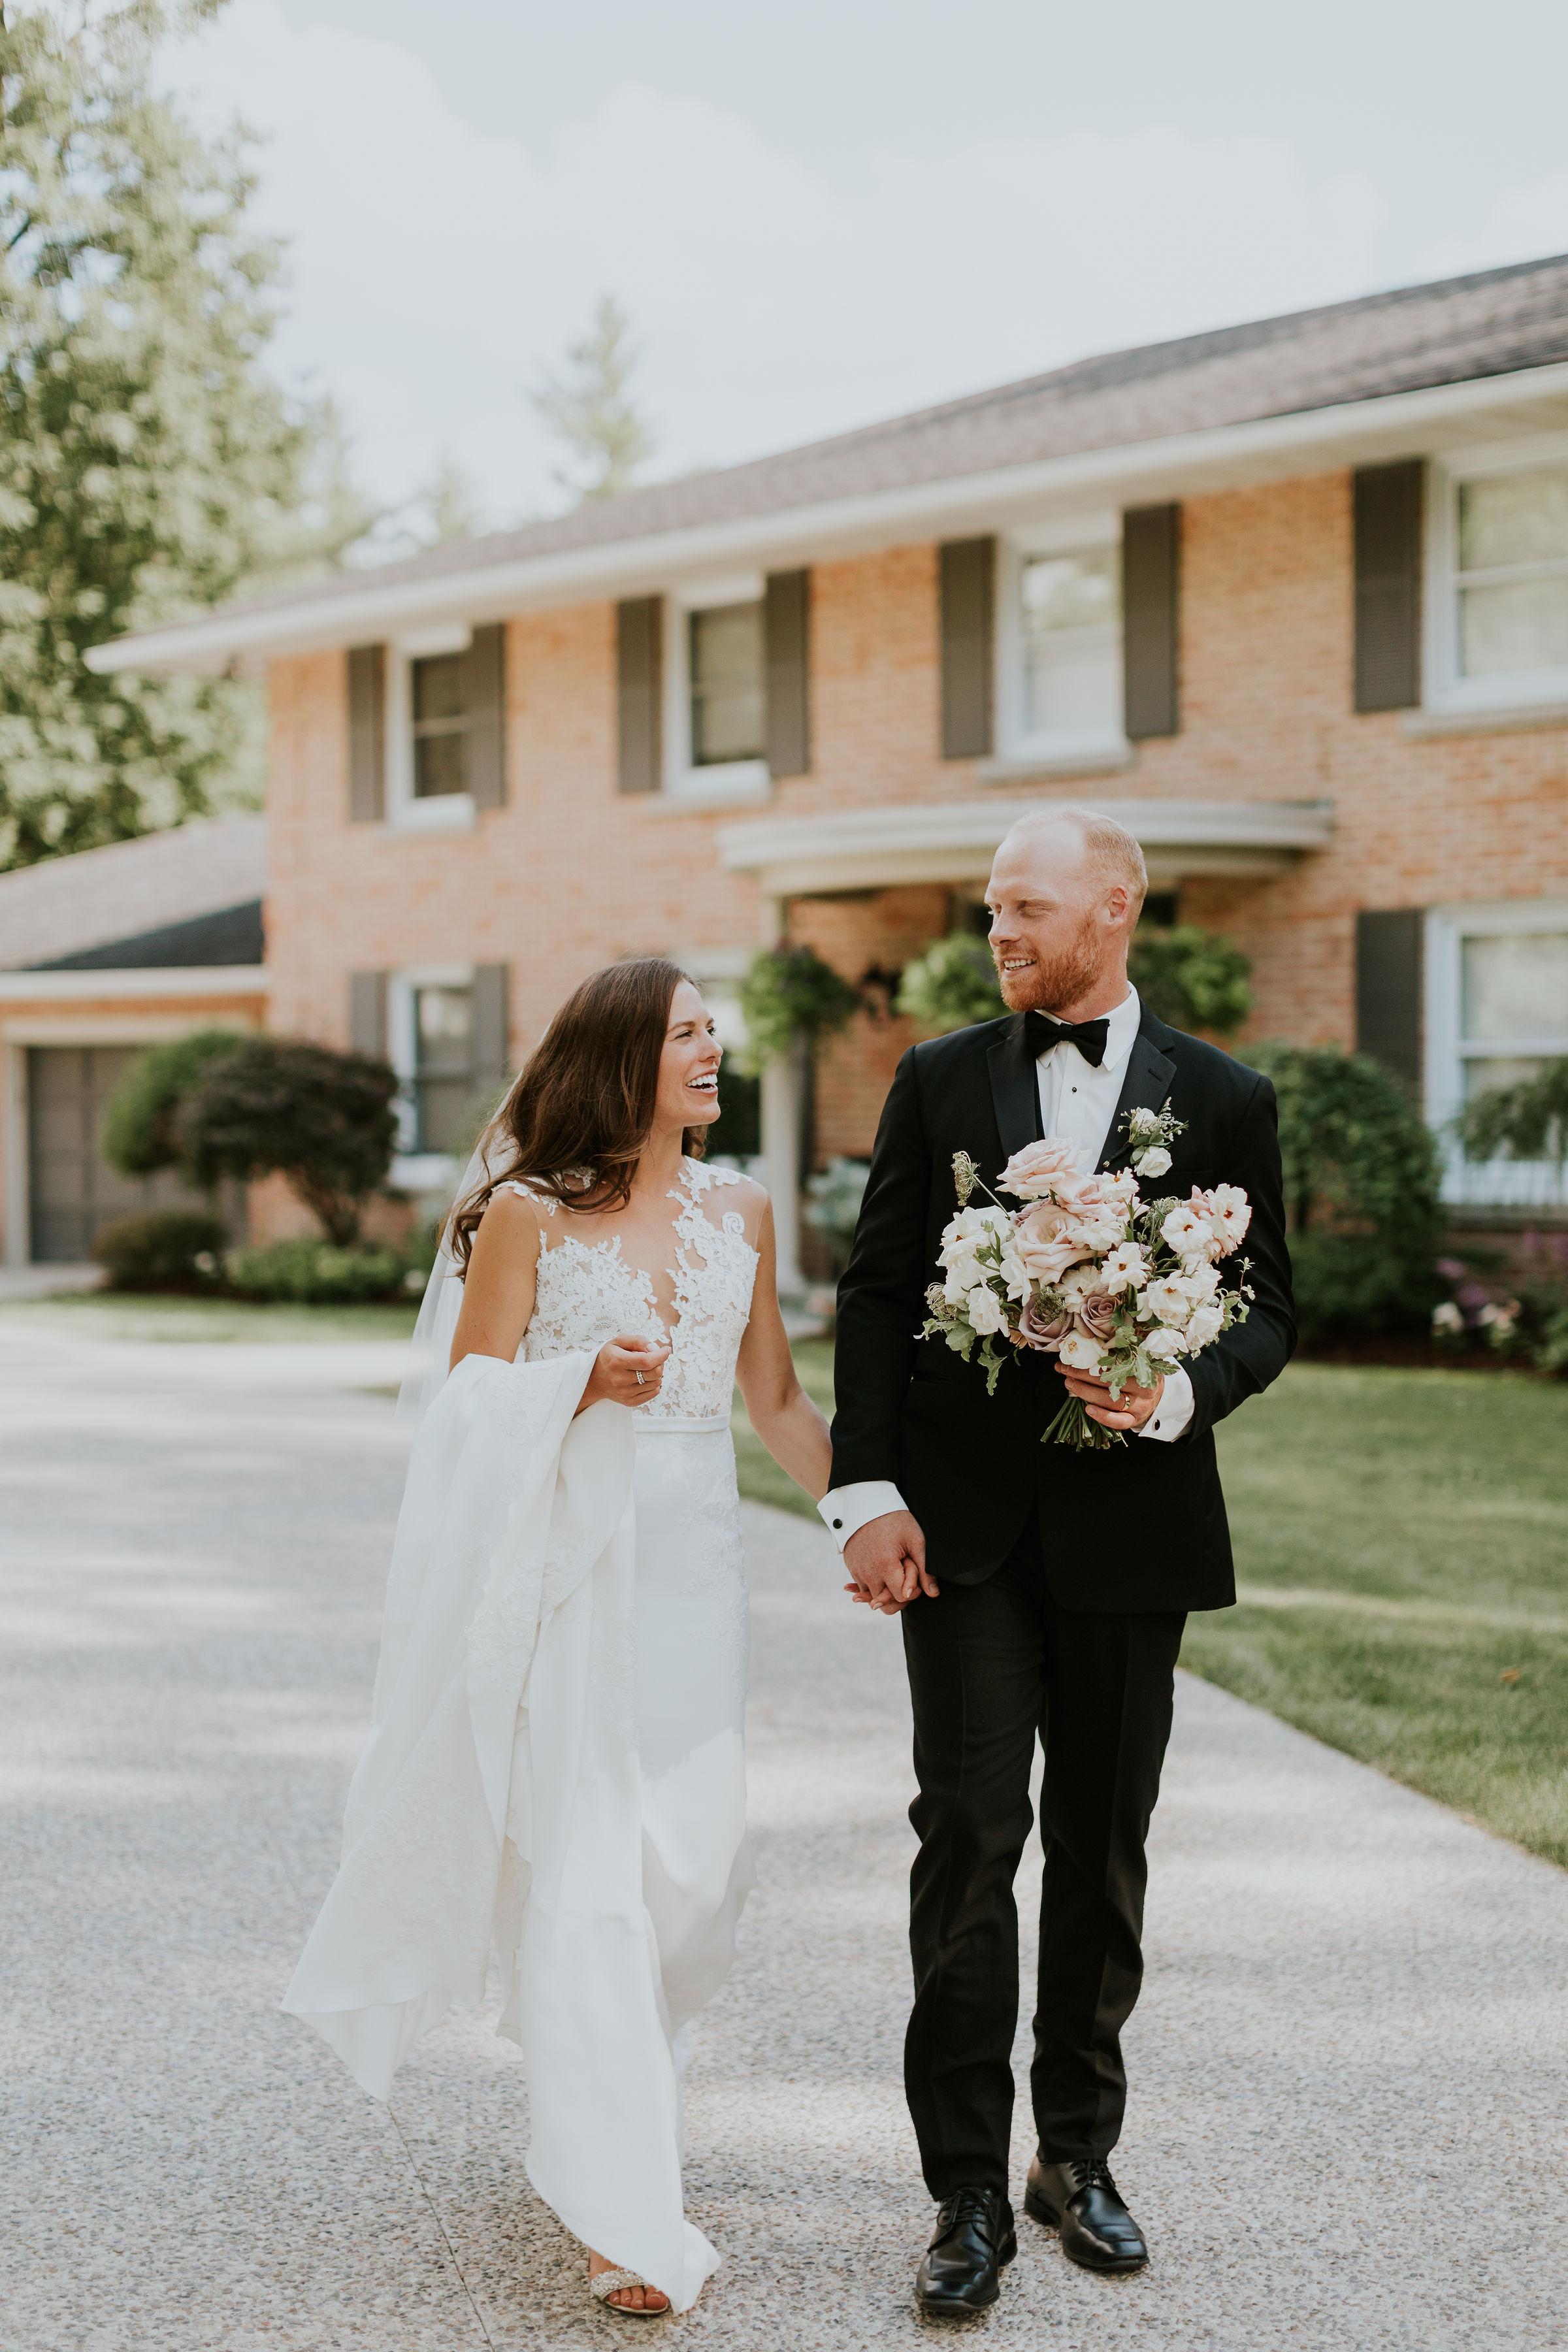 Erika + Geoff | Ontario, Canada | a family home